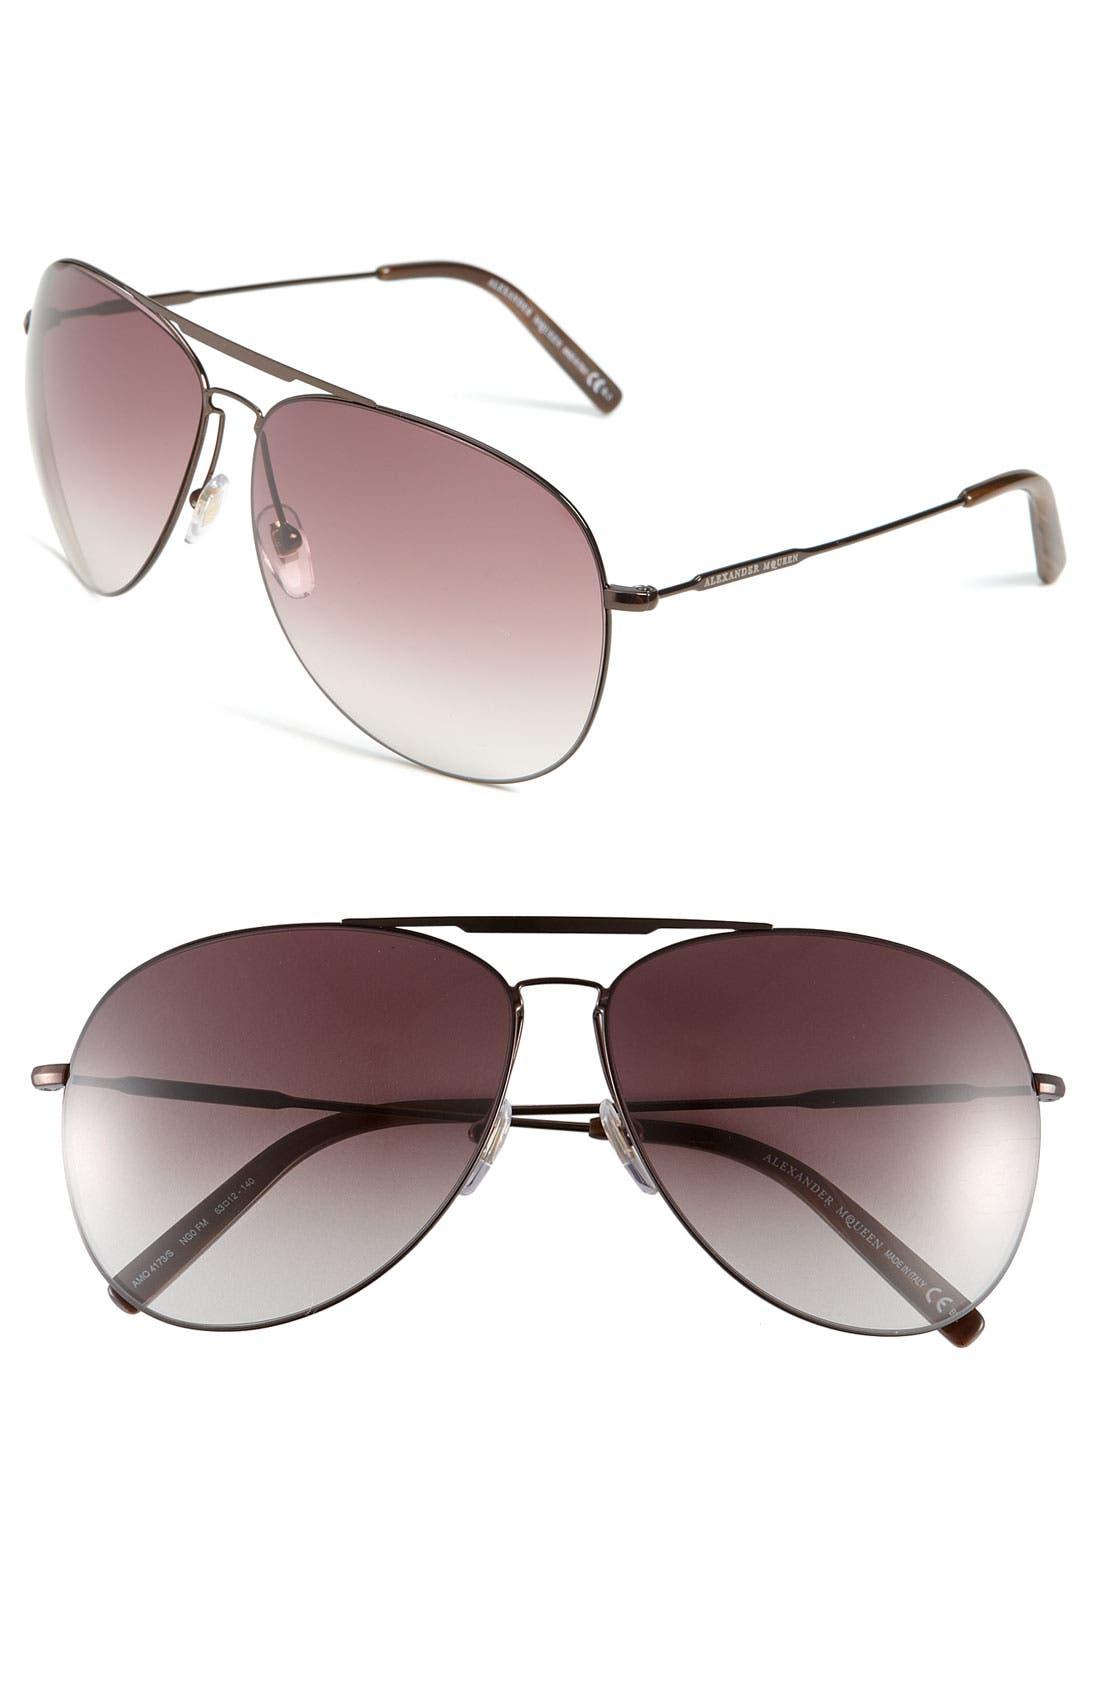 Main Image - Alexander McQueen Metal Aviator Sunglasses